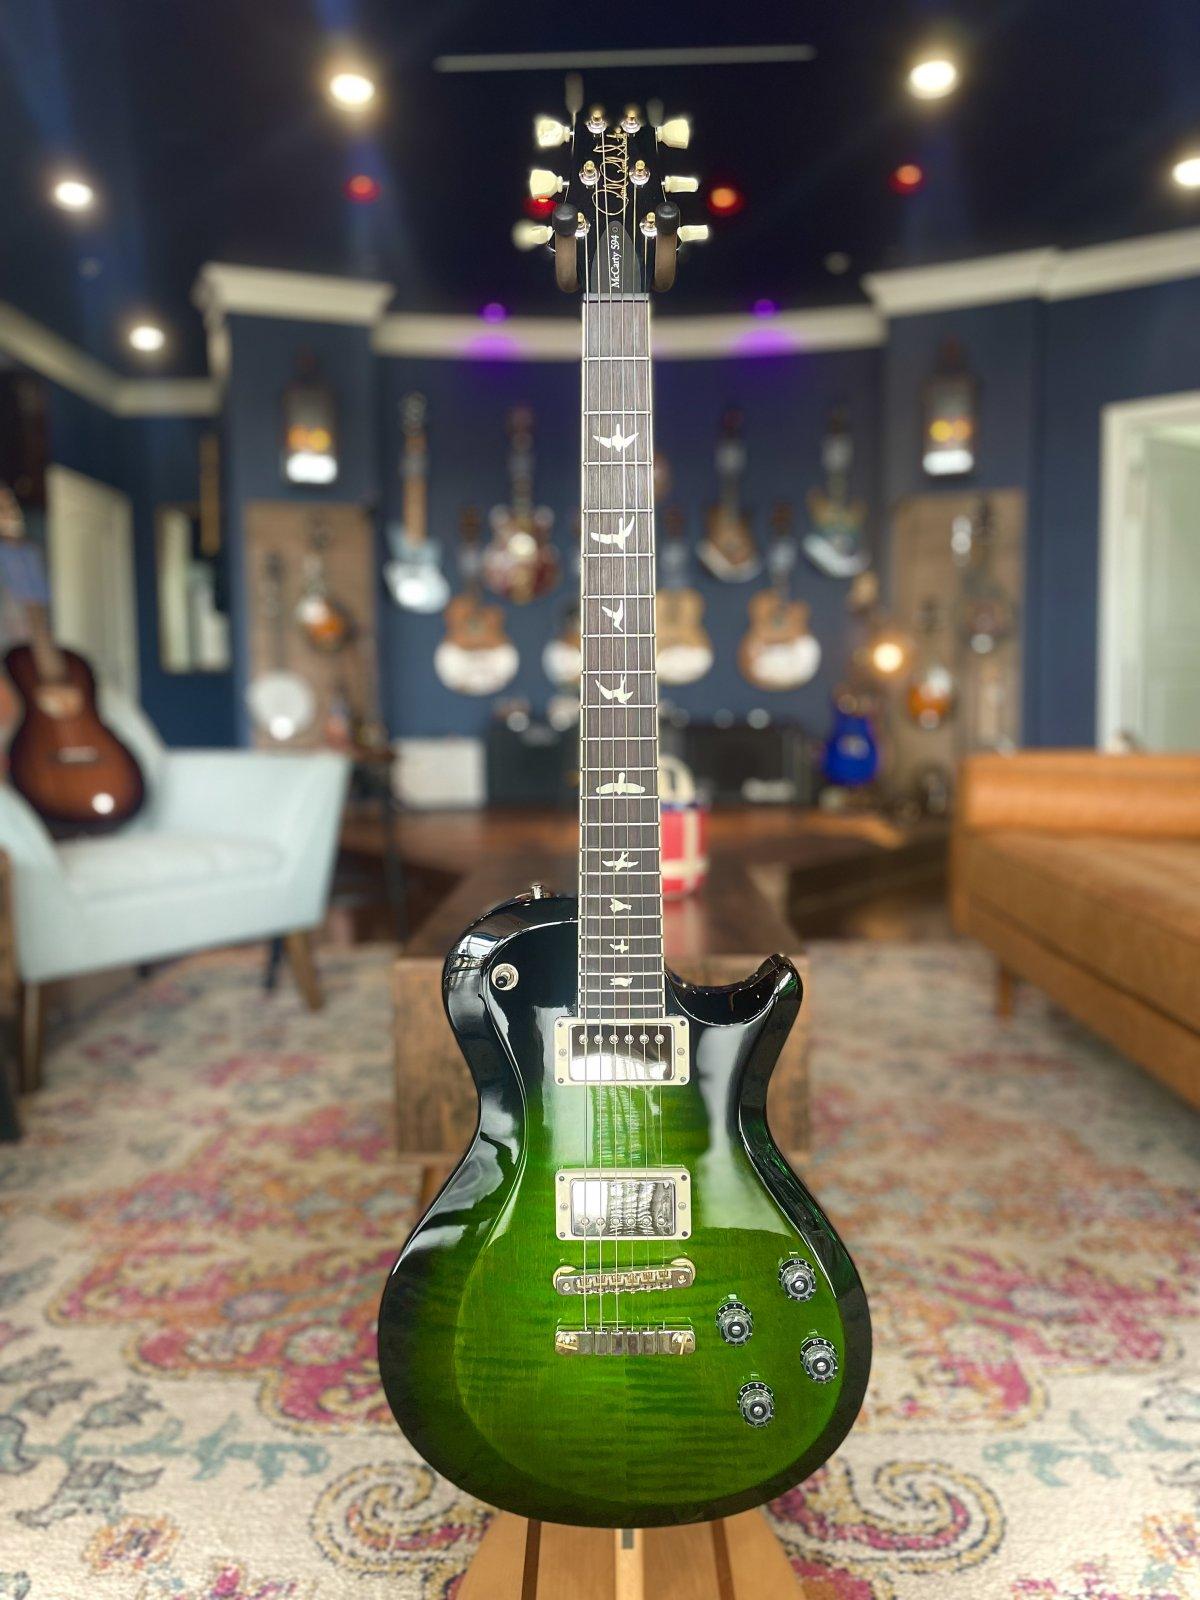 PRS S2 McCarty 594 Singlecut Electric Guitar - Eriza Verde Wrap